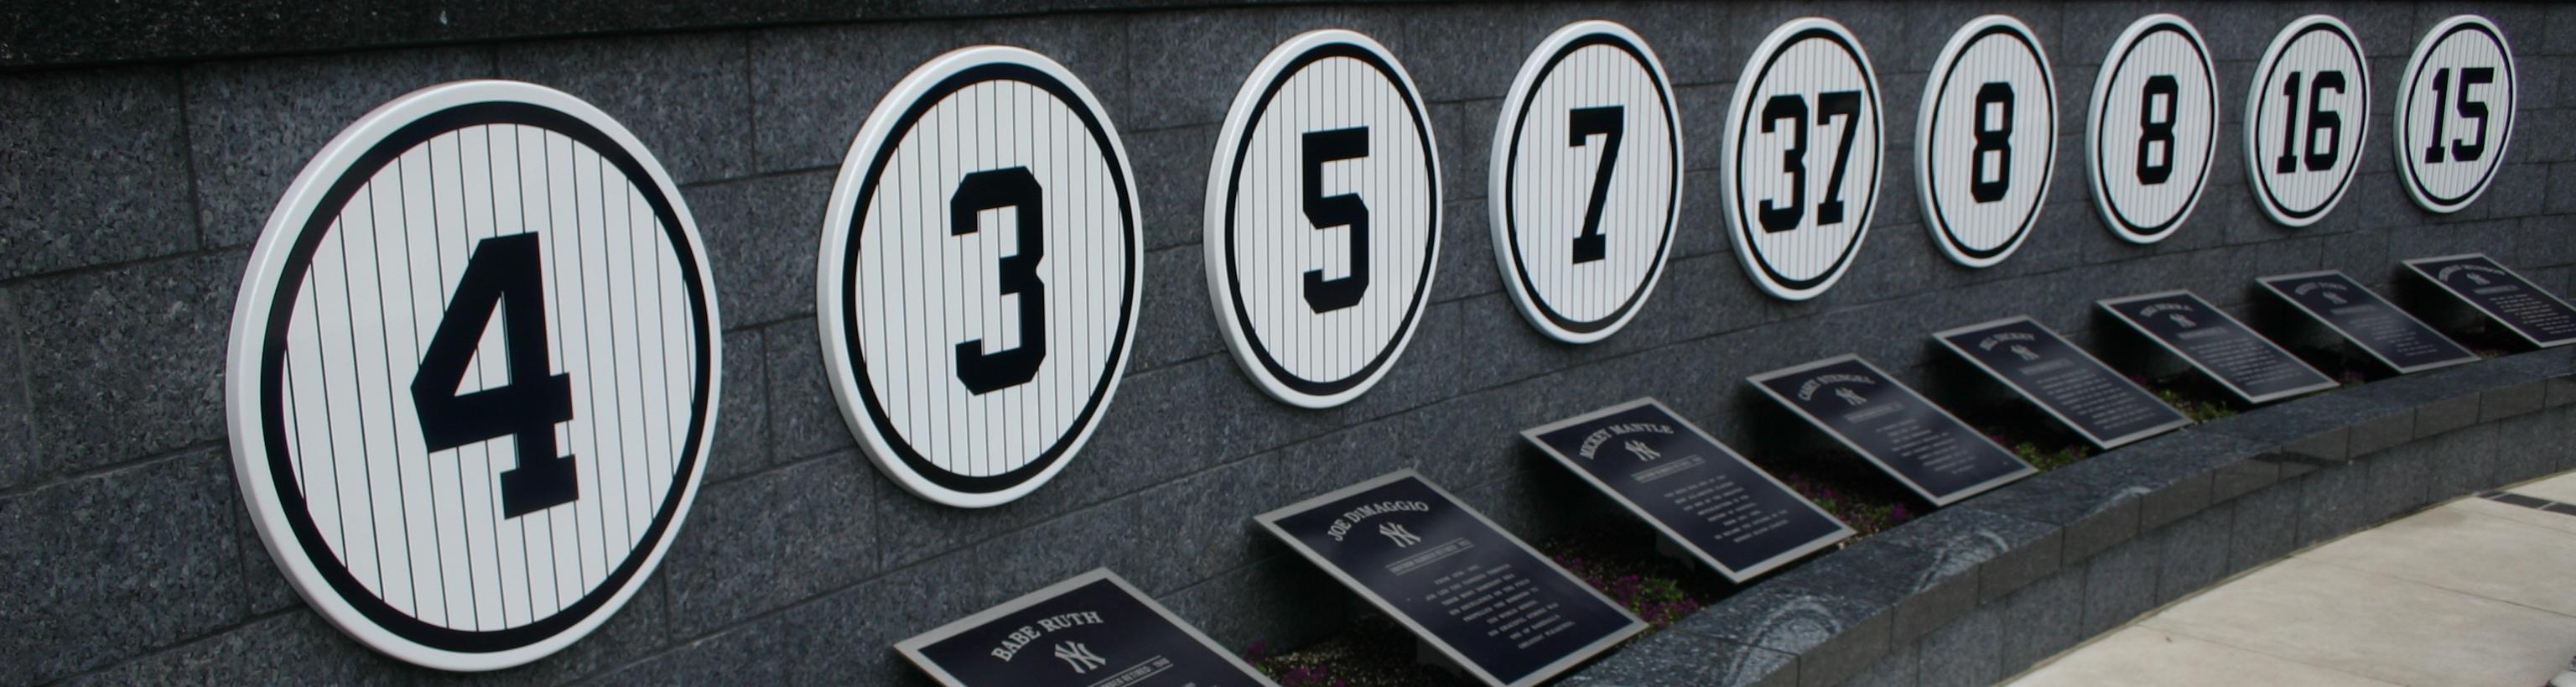 Yankee Stadium,Monument Park,East Coast Baseball Tour,Baseball Road Trip